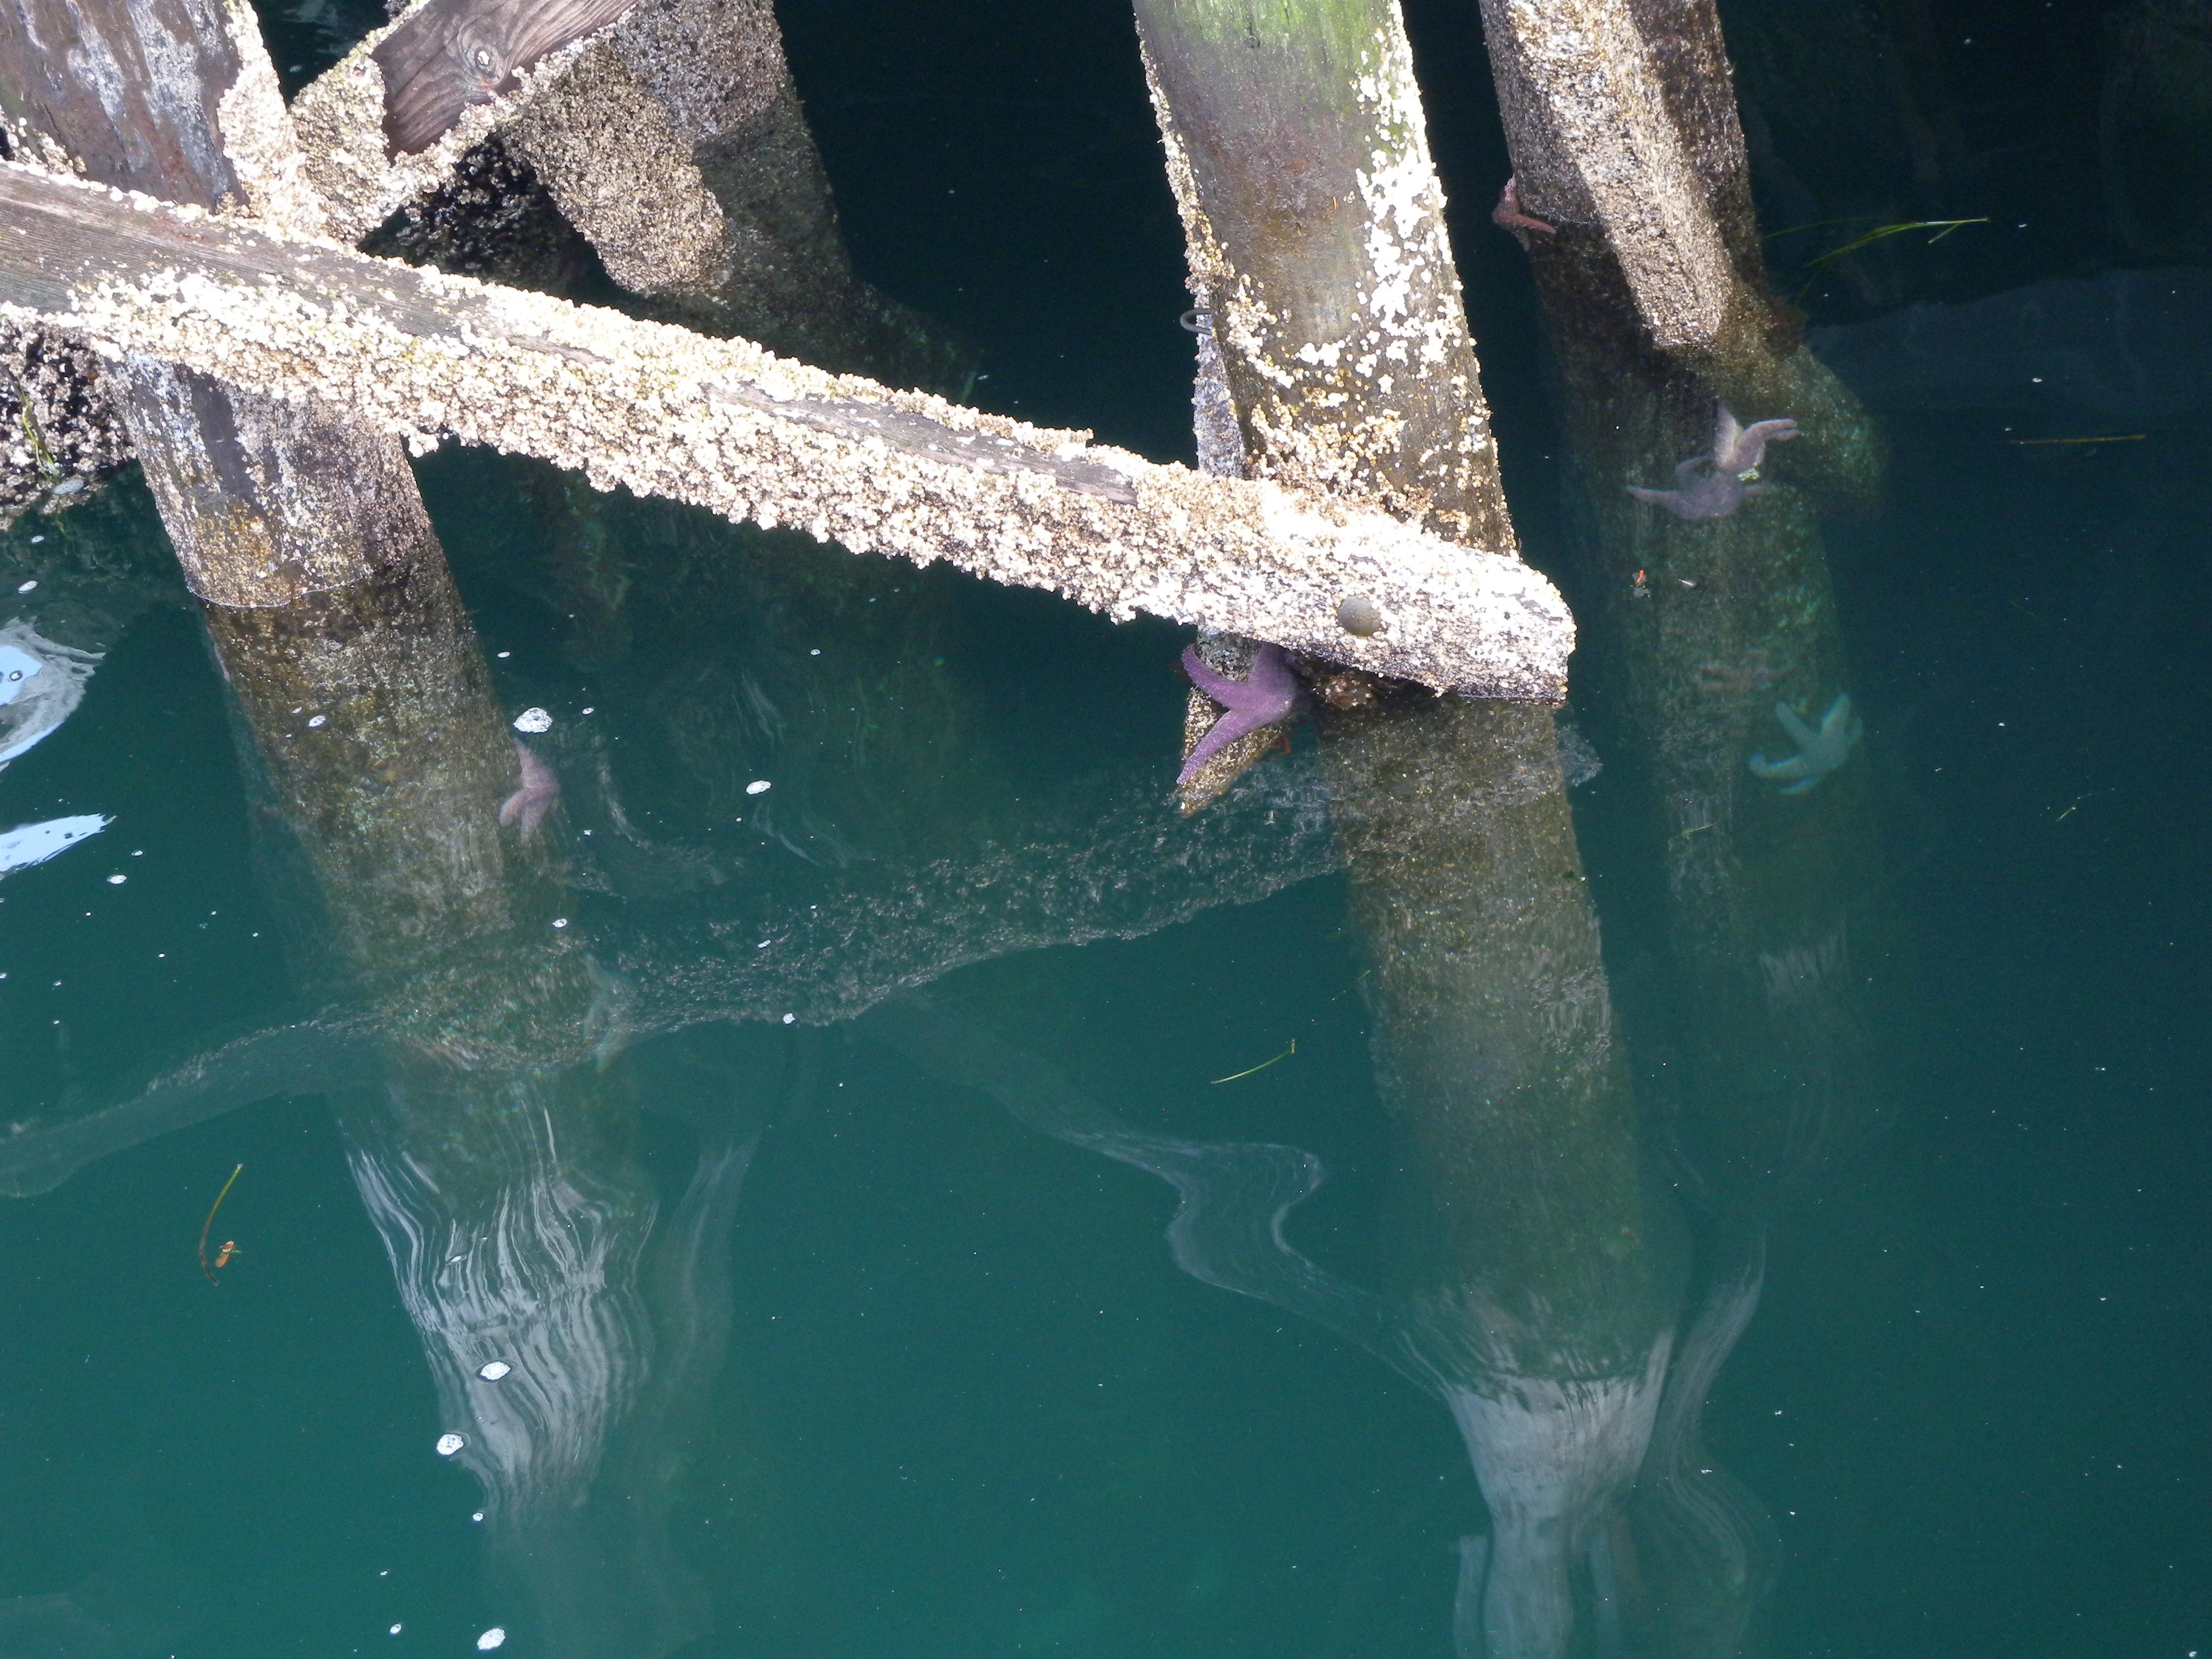 Starfish below